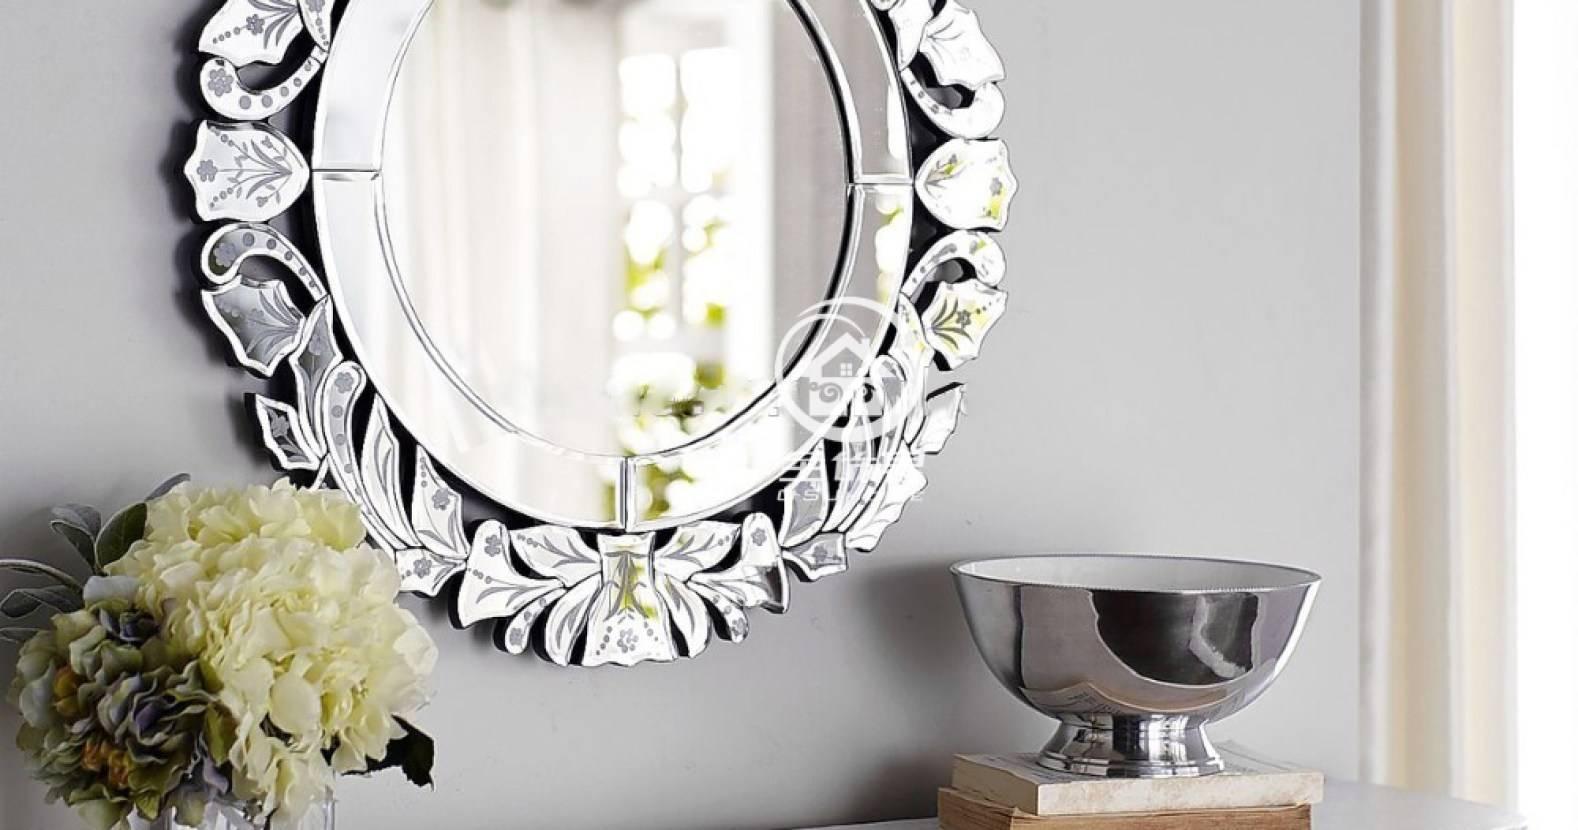 Mirror : Venetian Mirrors Cheap Cheap Venetian Mirrors Venetian inside Cheap Venetian Mirrors (Image 10 of 15)